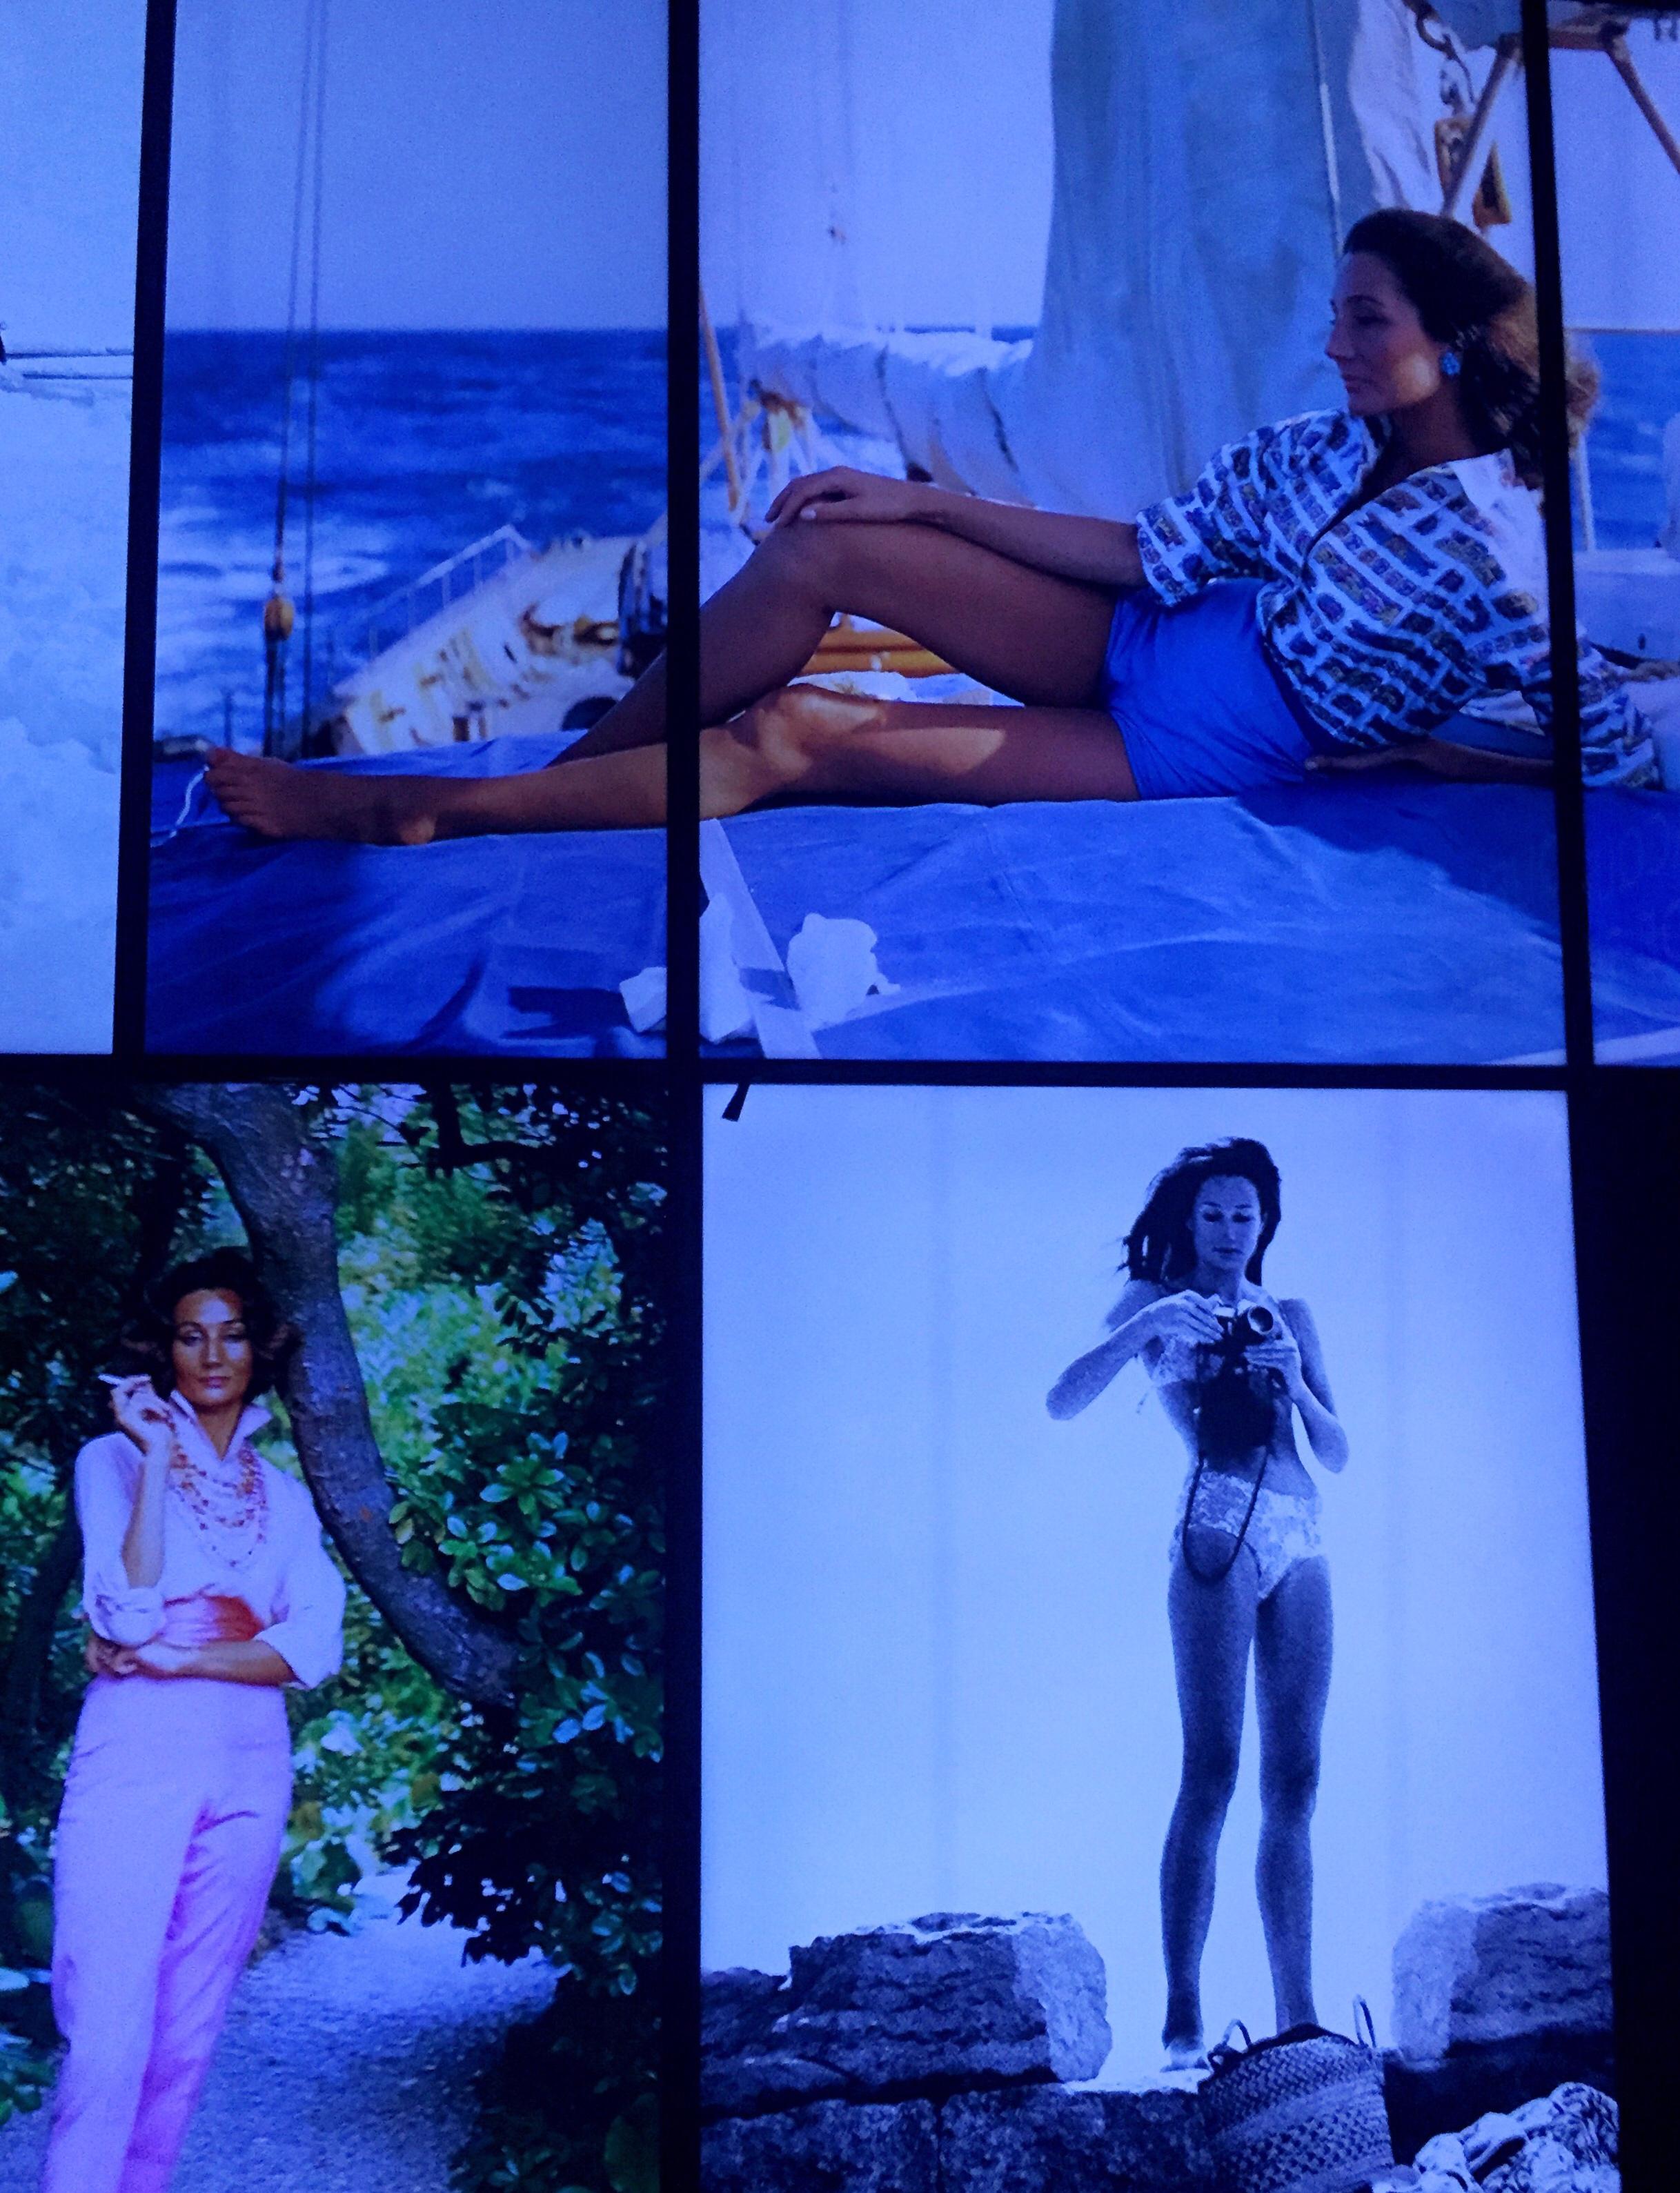 Photos of Jacqueline de Ribes through the years.